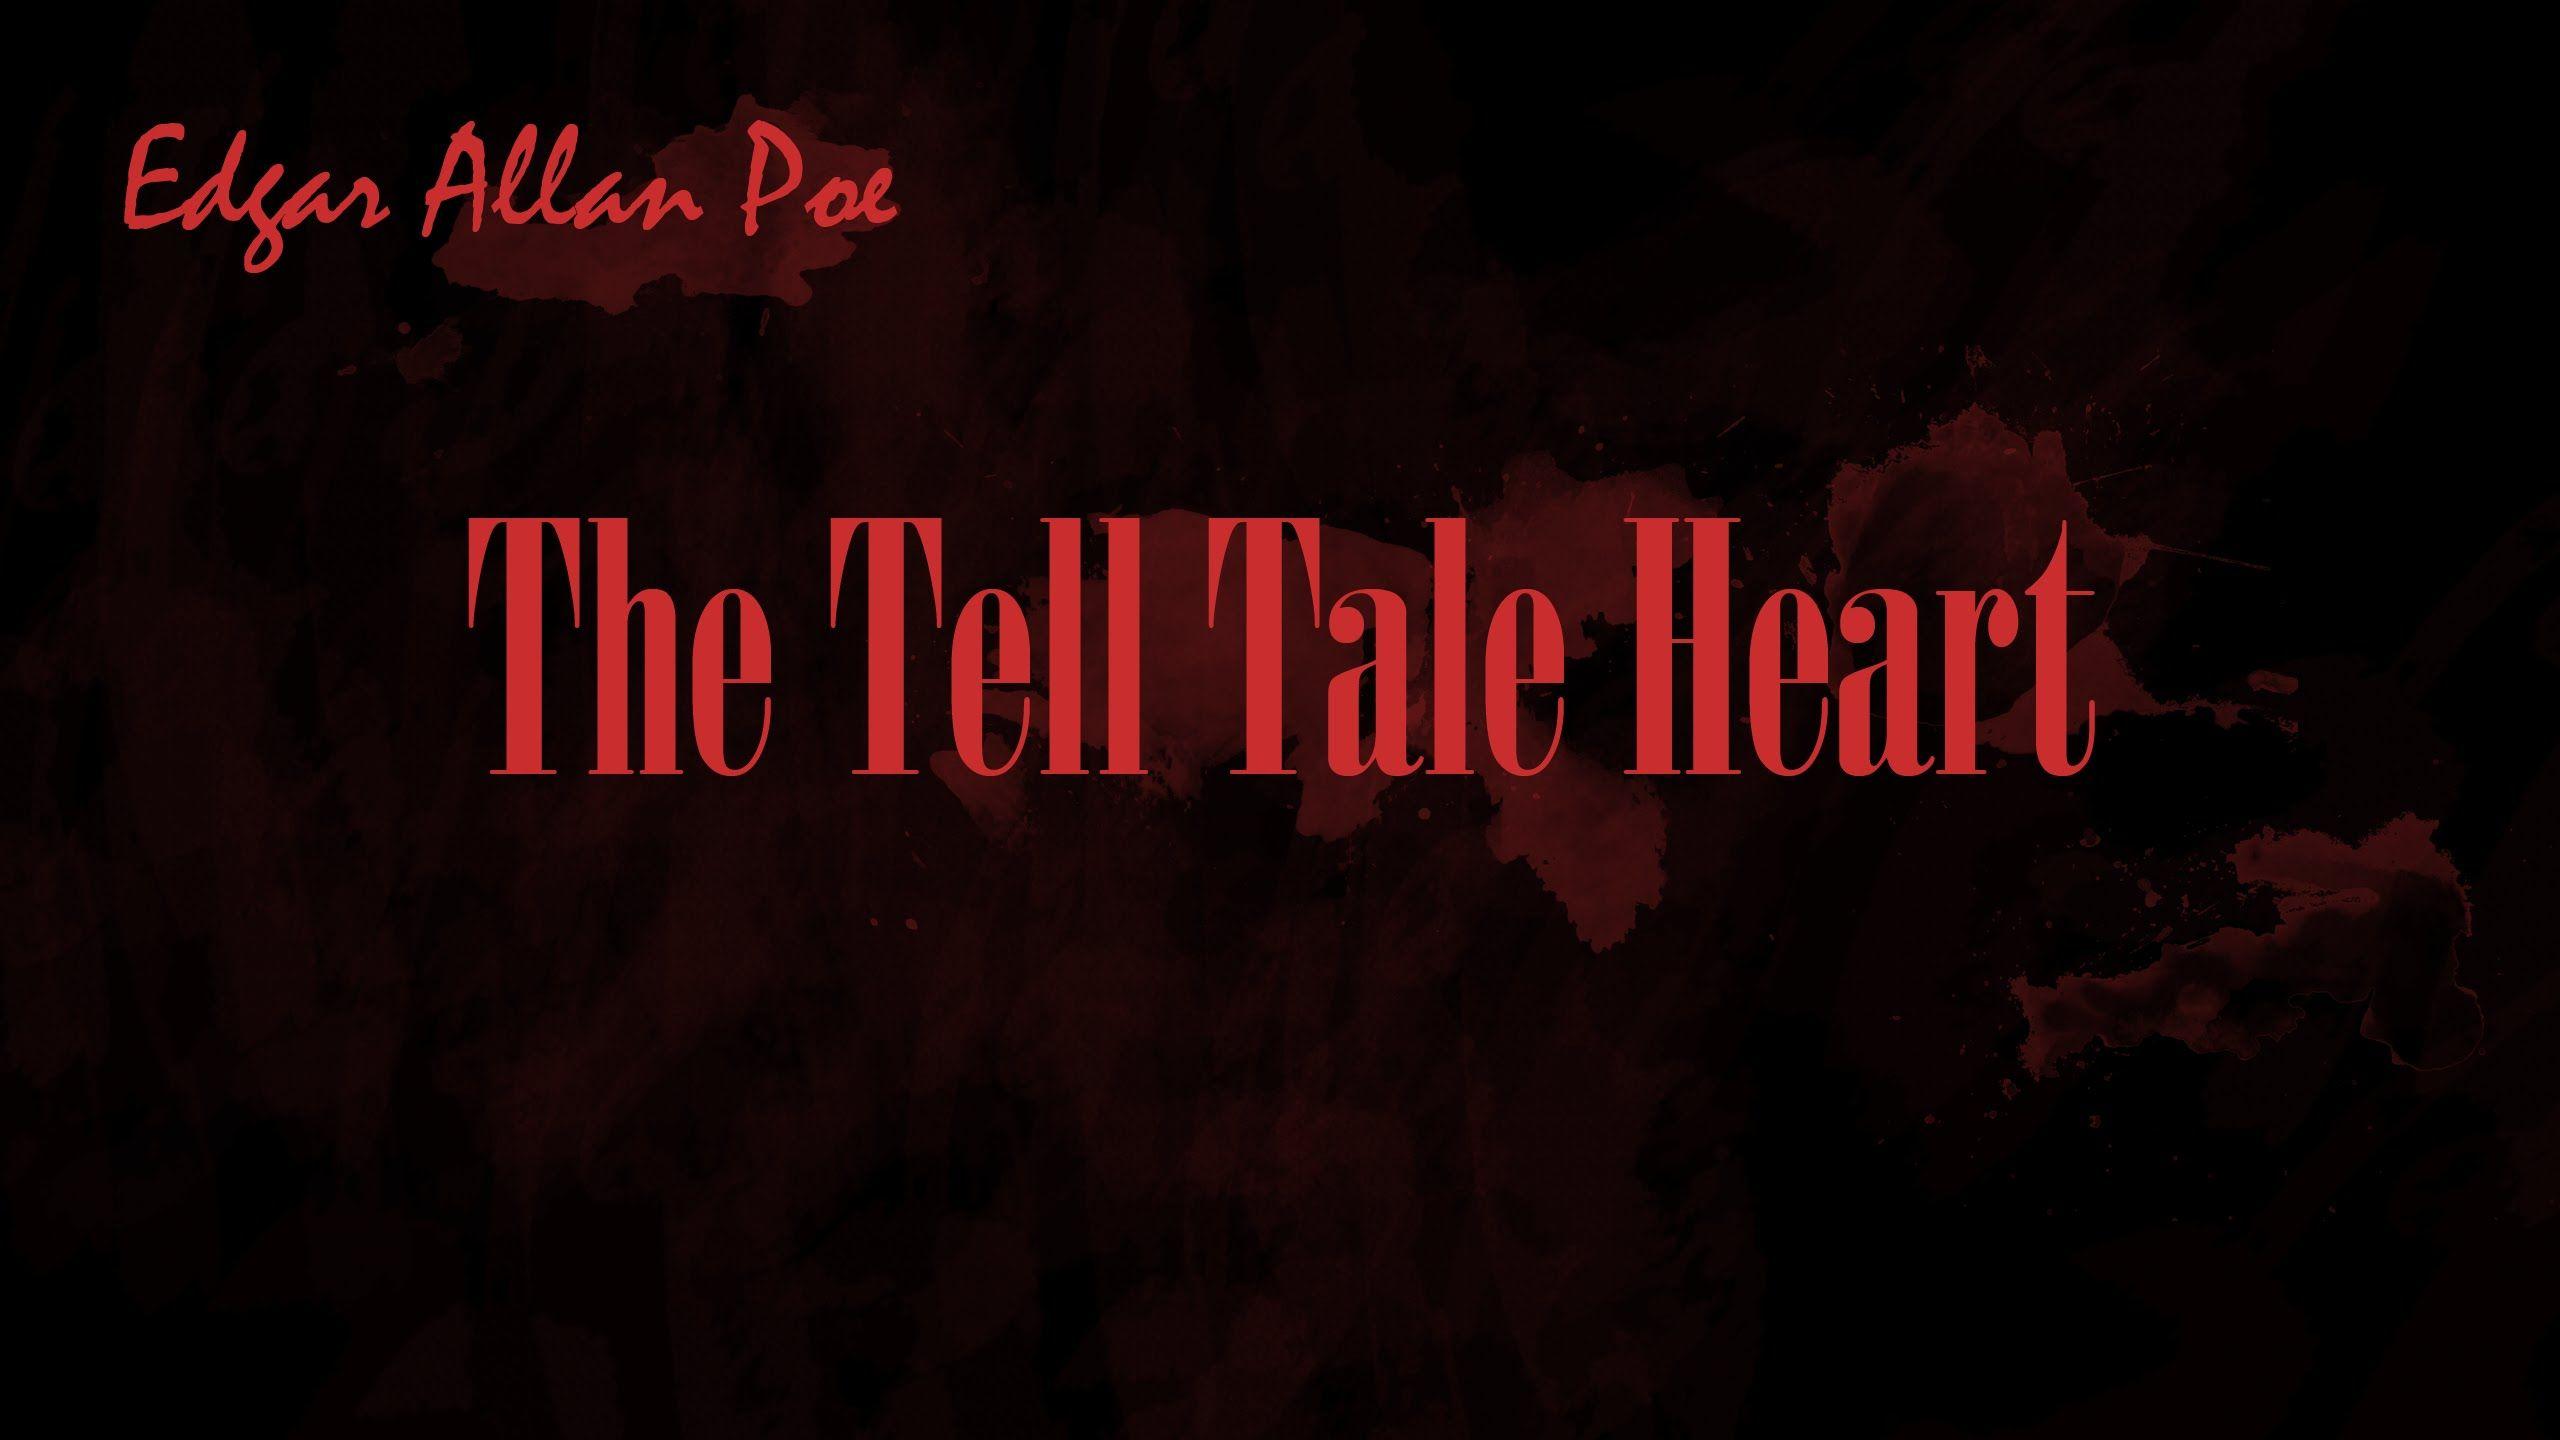 """The Tell-Tale Heart"" by Edgar Allan Poe (1843)"